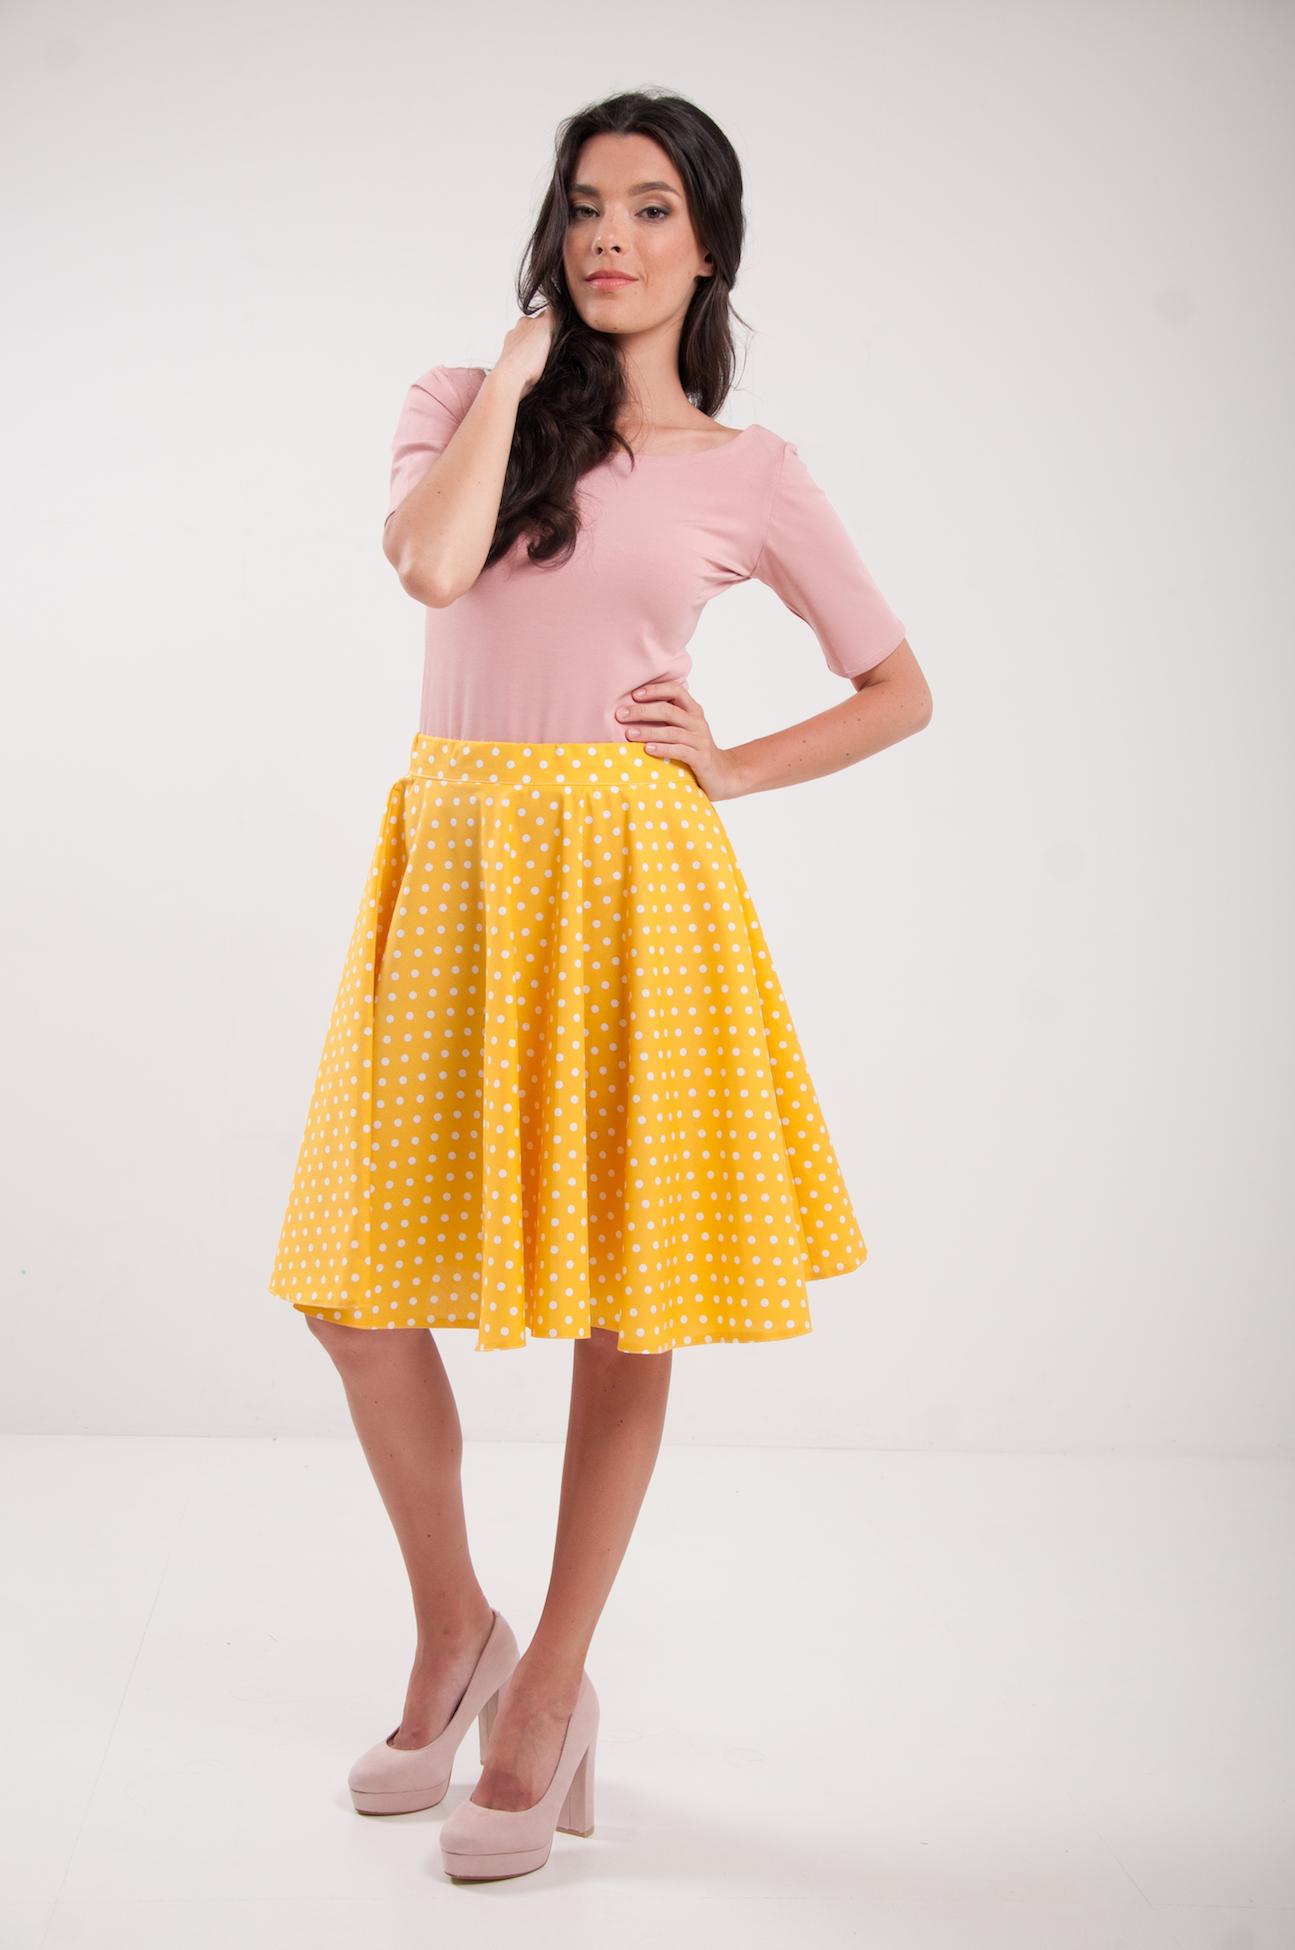 a00a92aa6482 Kruhová bodkovaná sukňa modrá žltá